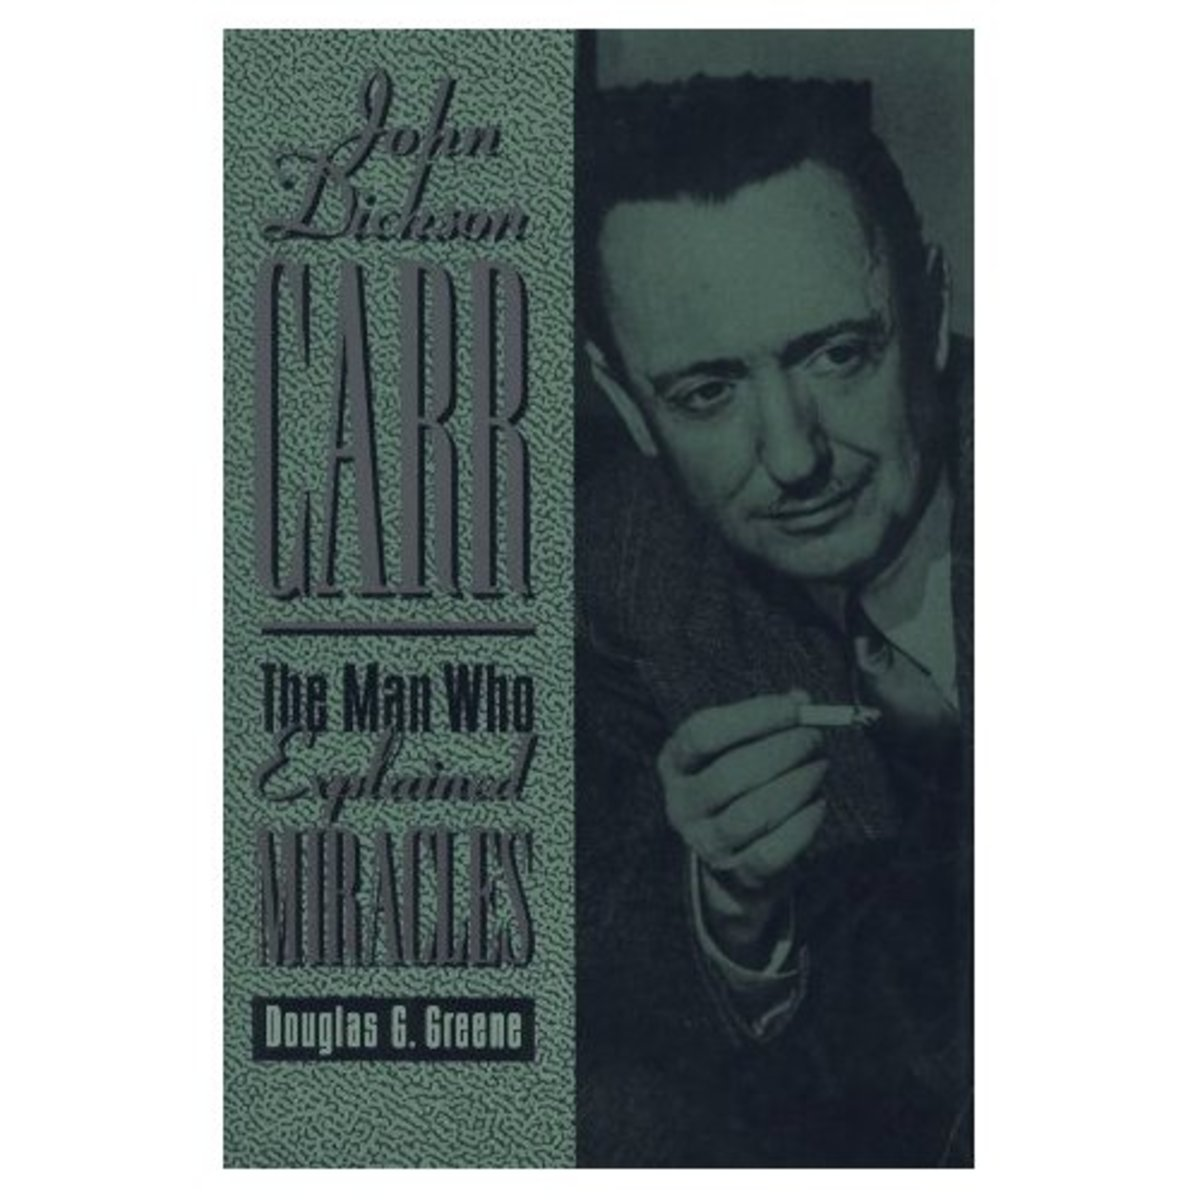 Carr Biography - Douglas R Greene